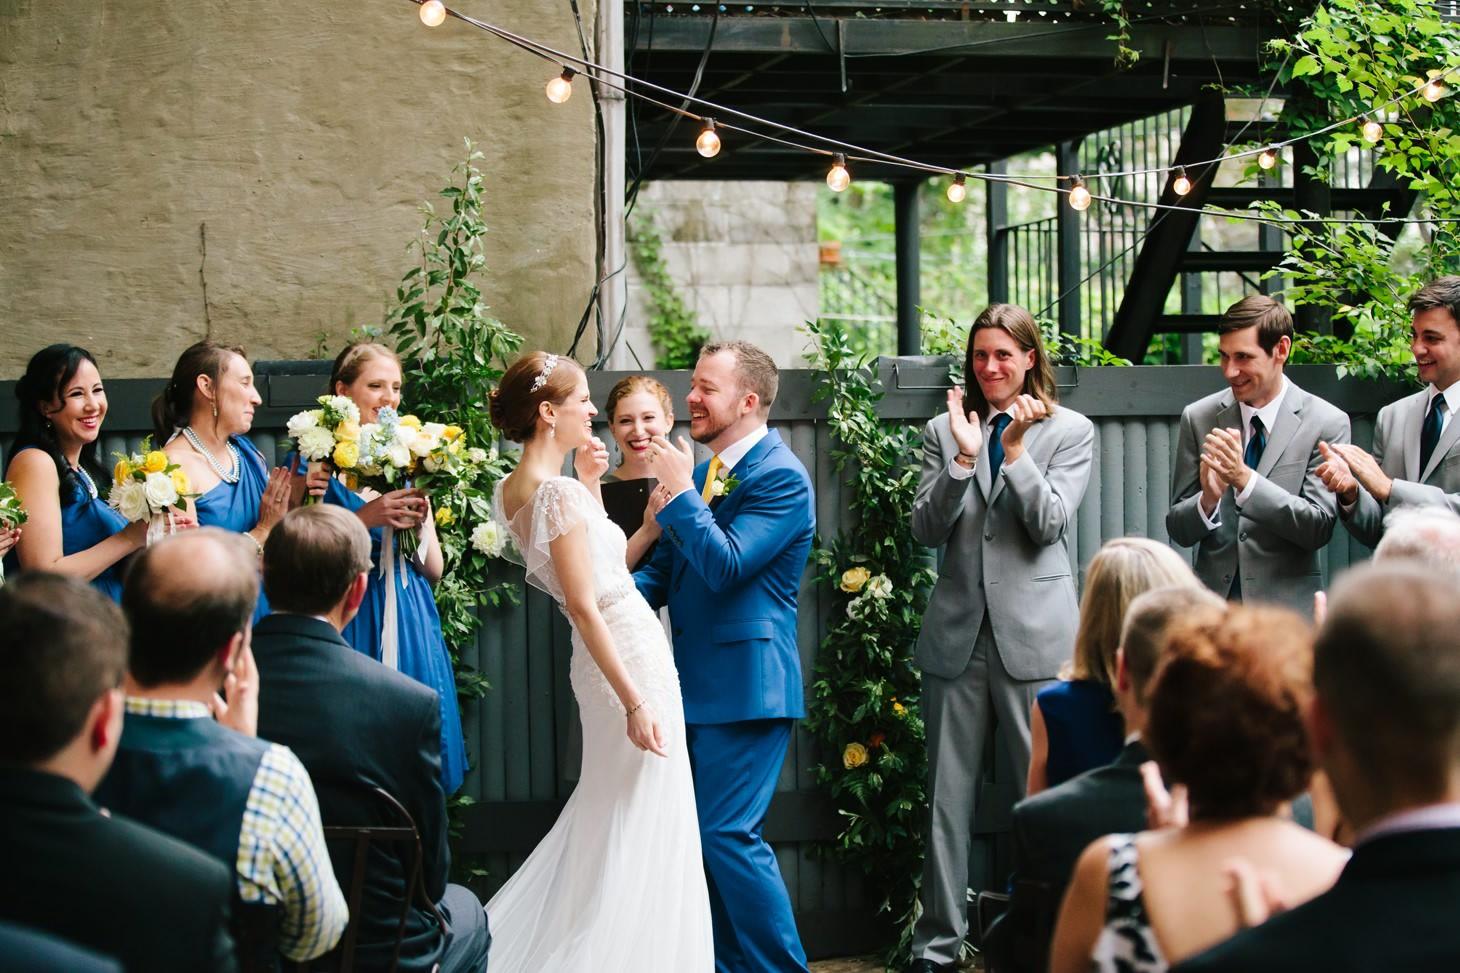 x-brooklyn-restaurant-wedding-nyc-weddingi-photographer-smitten-chickens149.jpg